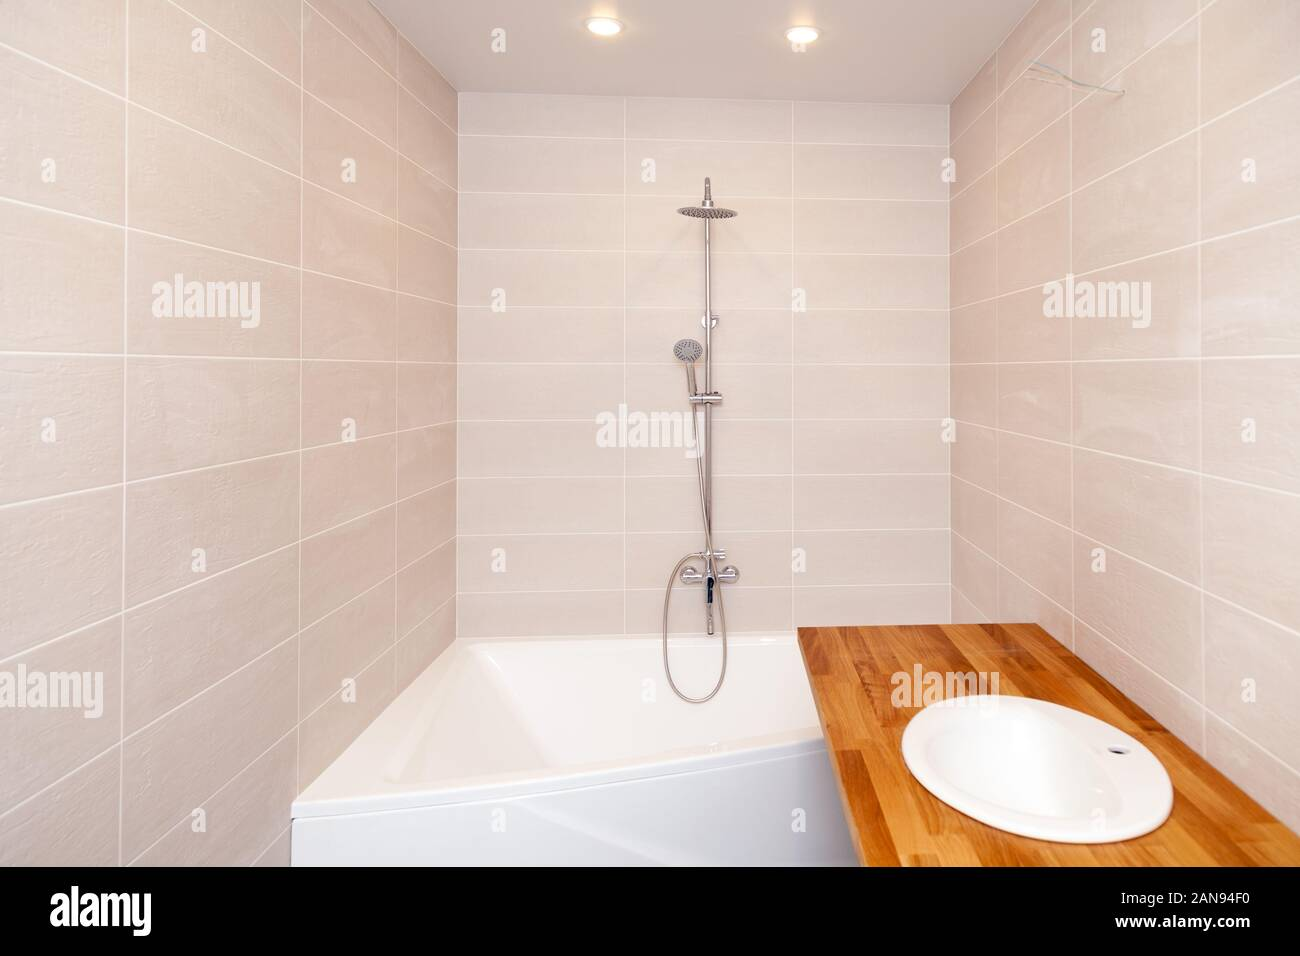 Empty New Bathroom With Beige Ceramic Rectangular Tiles Large